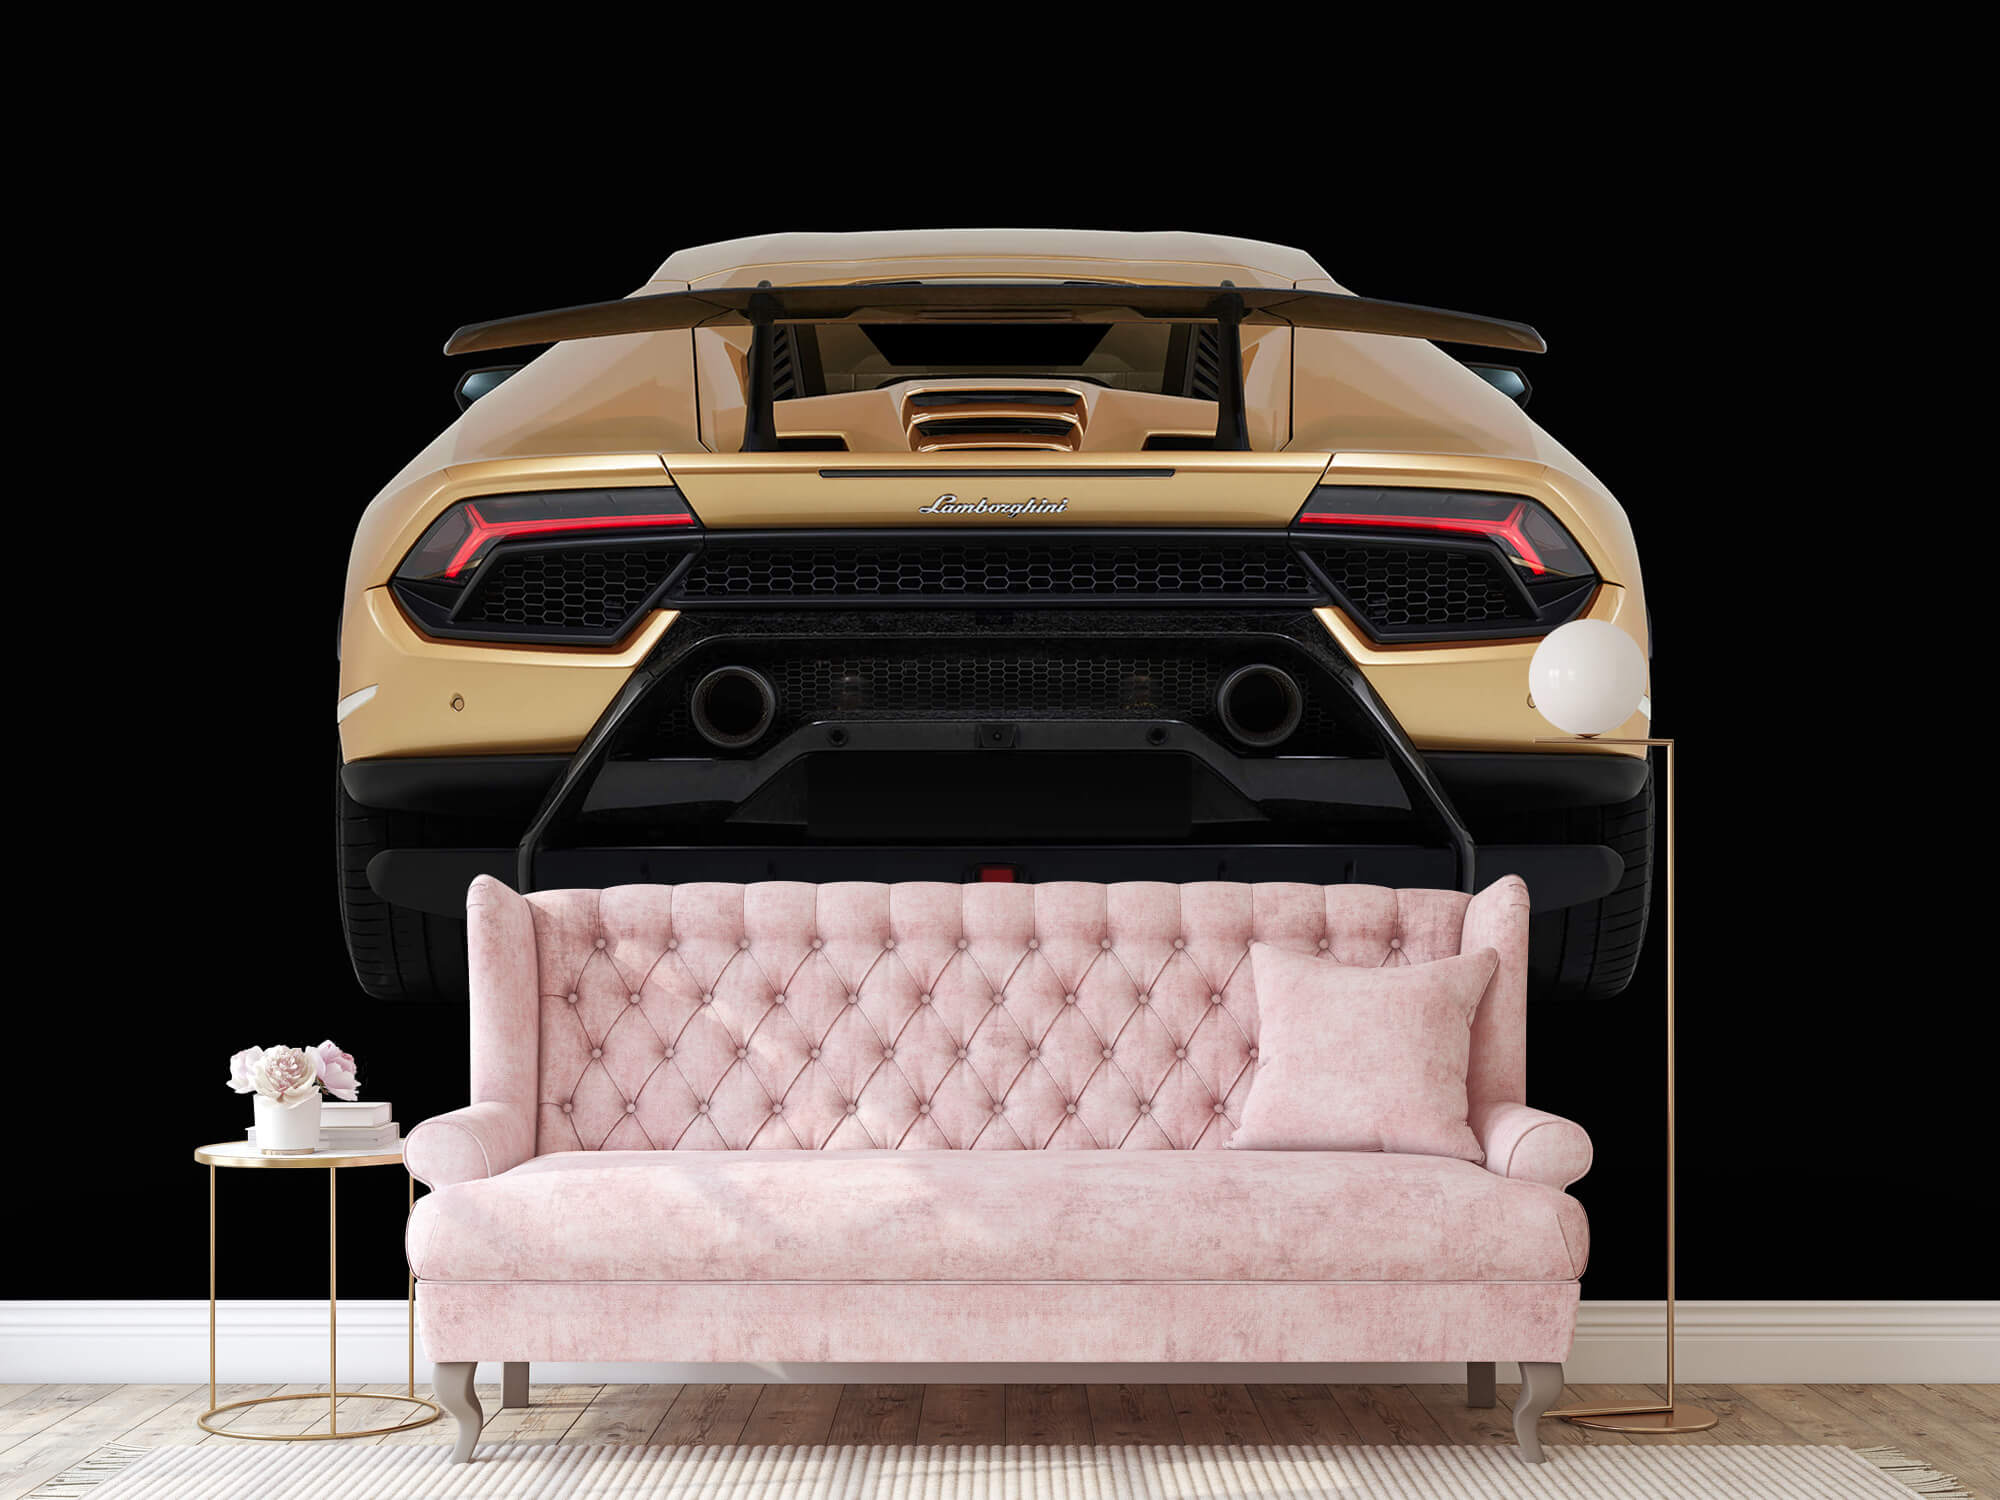 Wallpaper Lamborghini Huracán - Arrière, noir 13